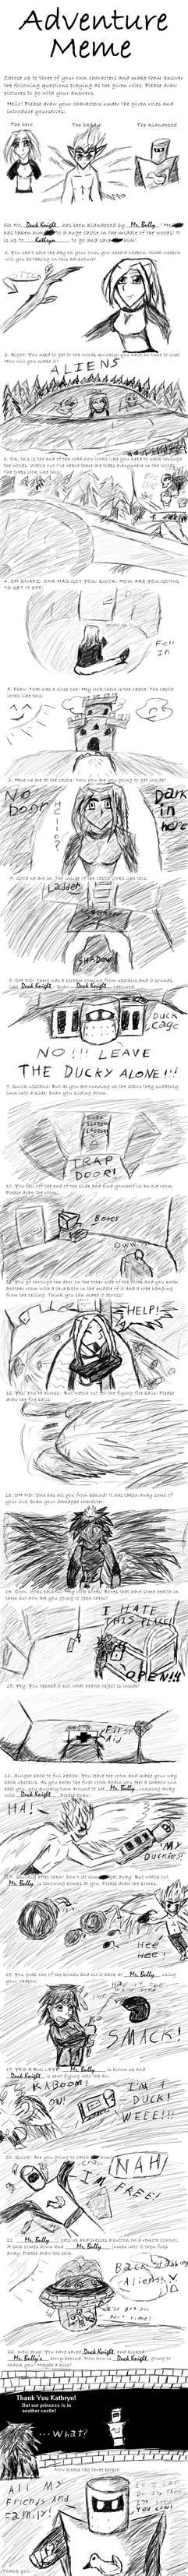 Jevolin 11: Adventure Meme by ChibiBoy108